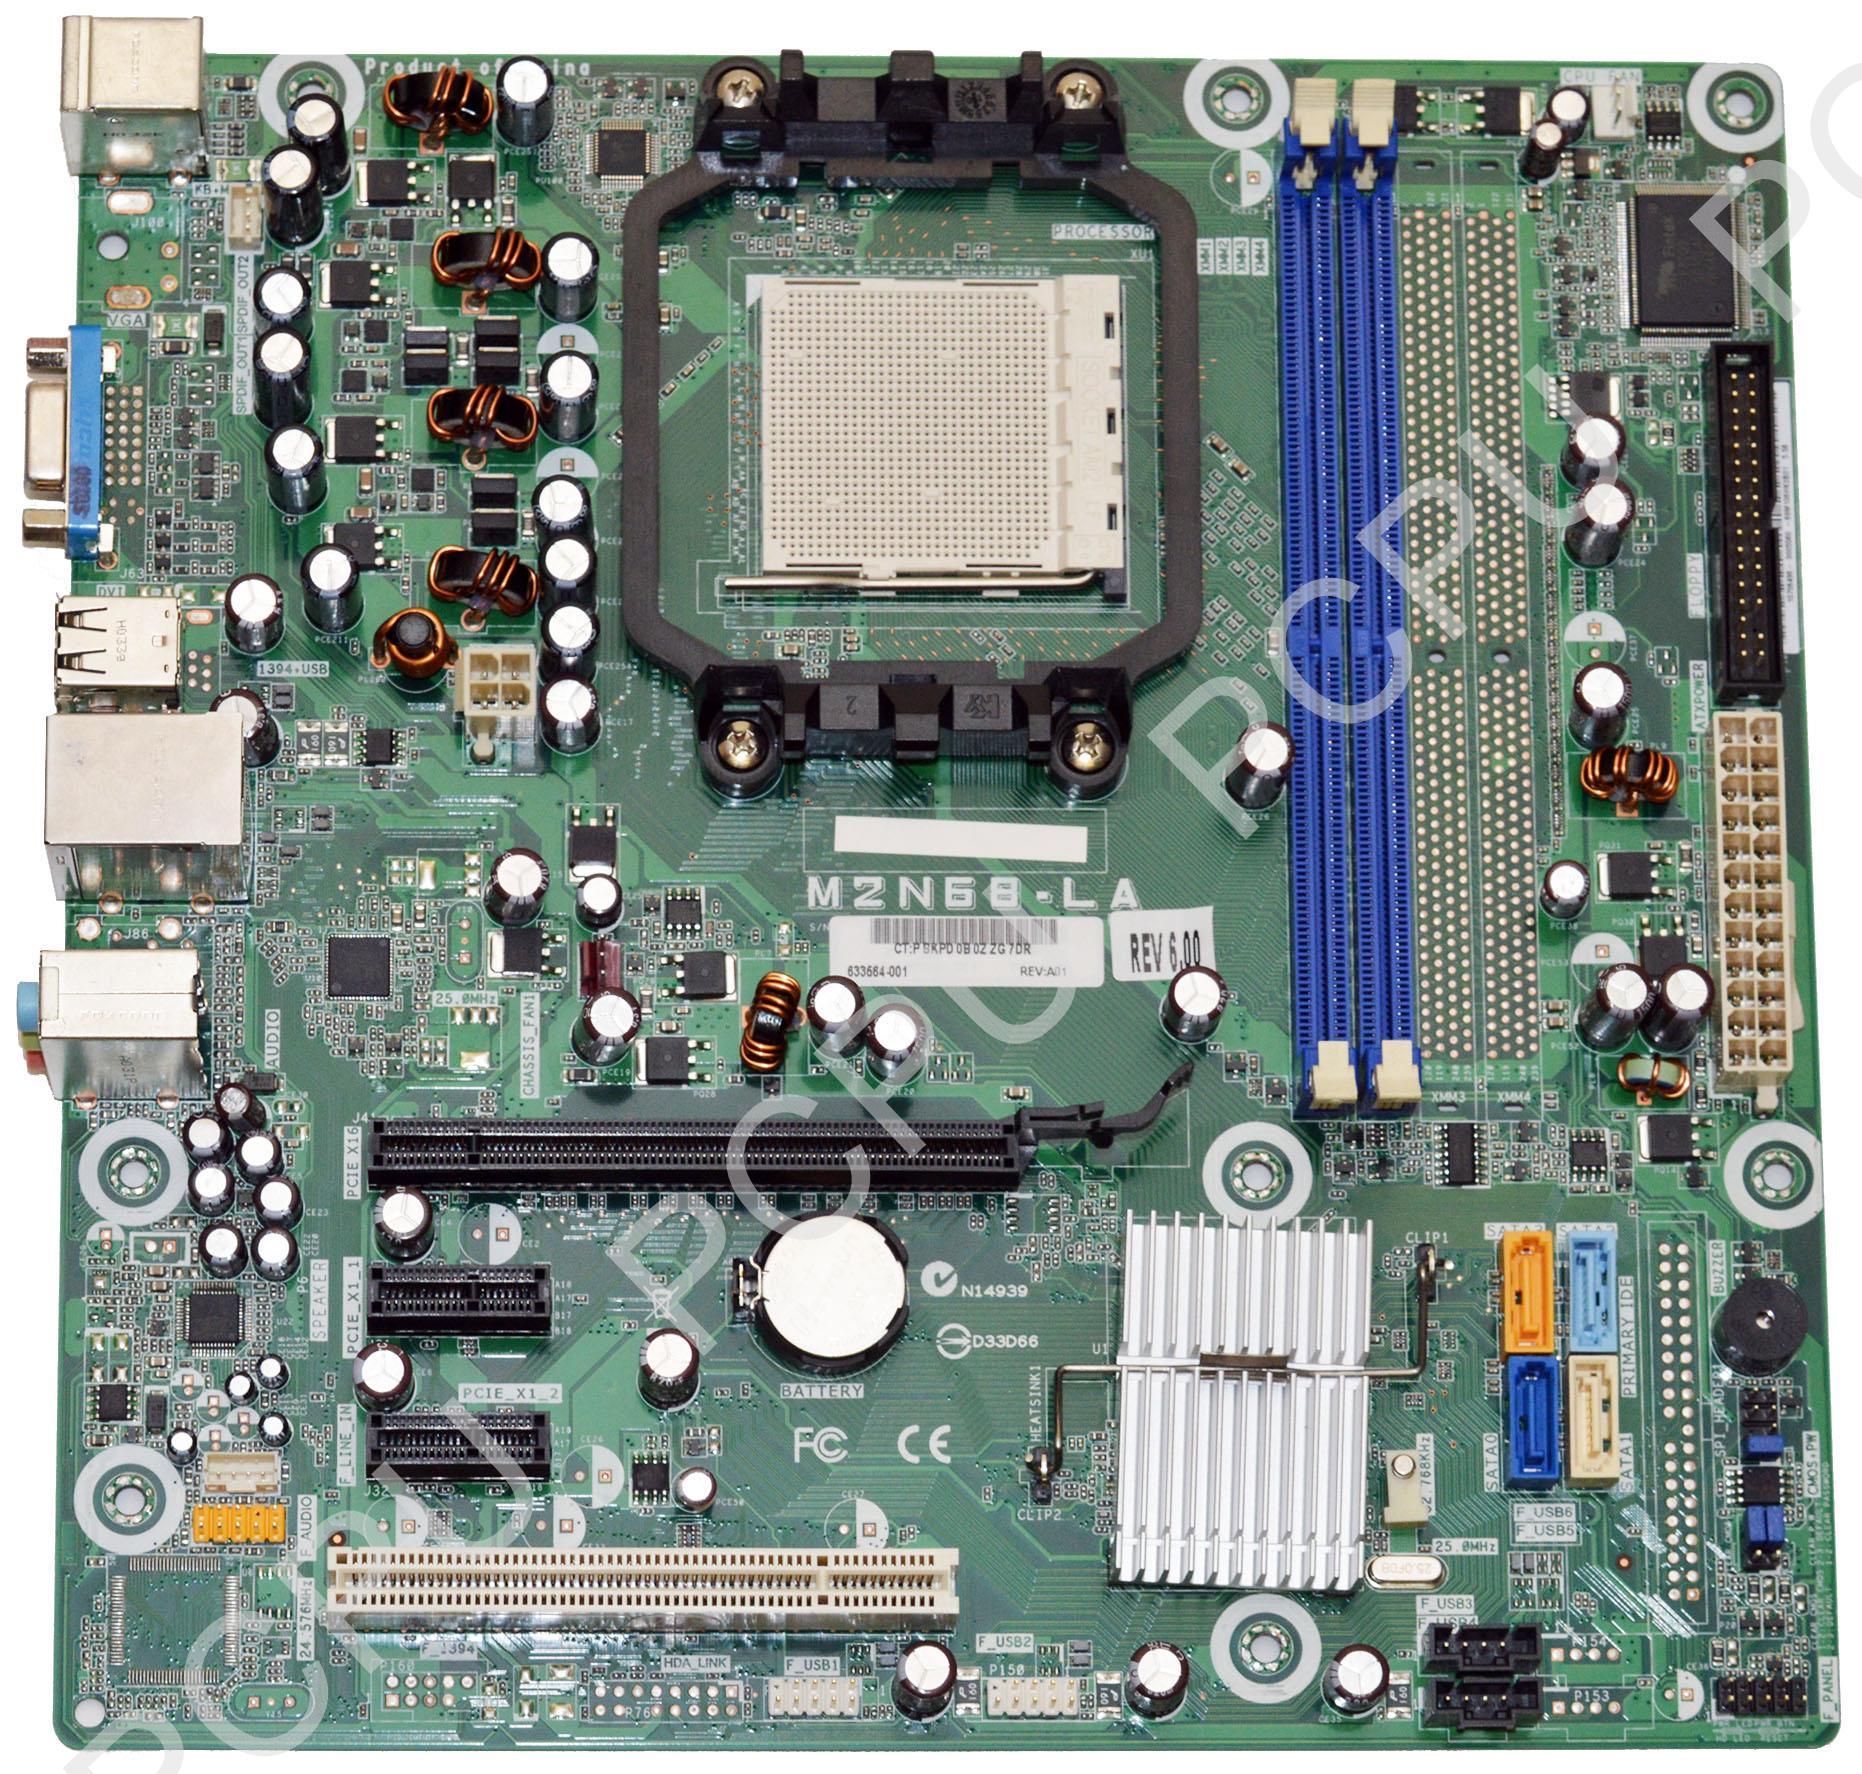 HP 633564-001 Hewlett-Packard M2n68-La Narra5 Pavilion Sl...